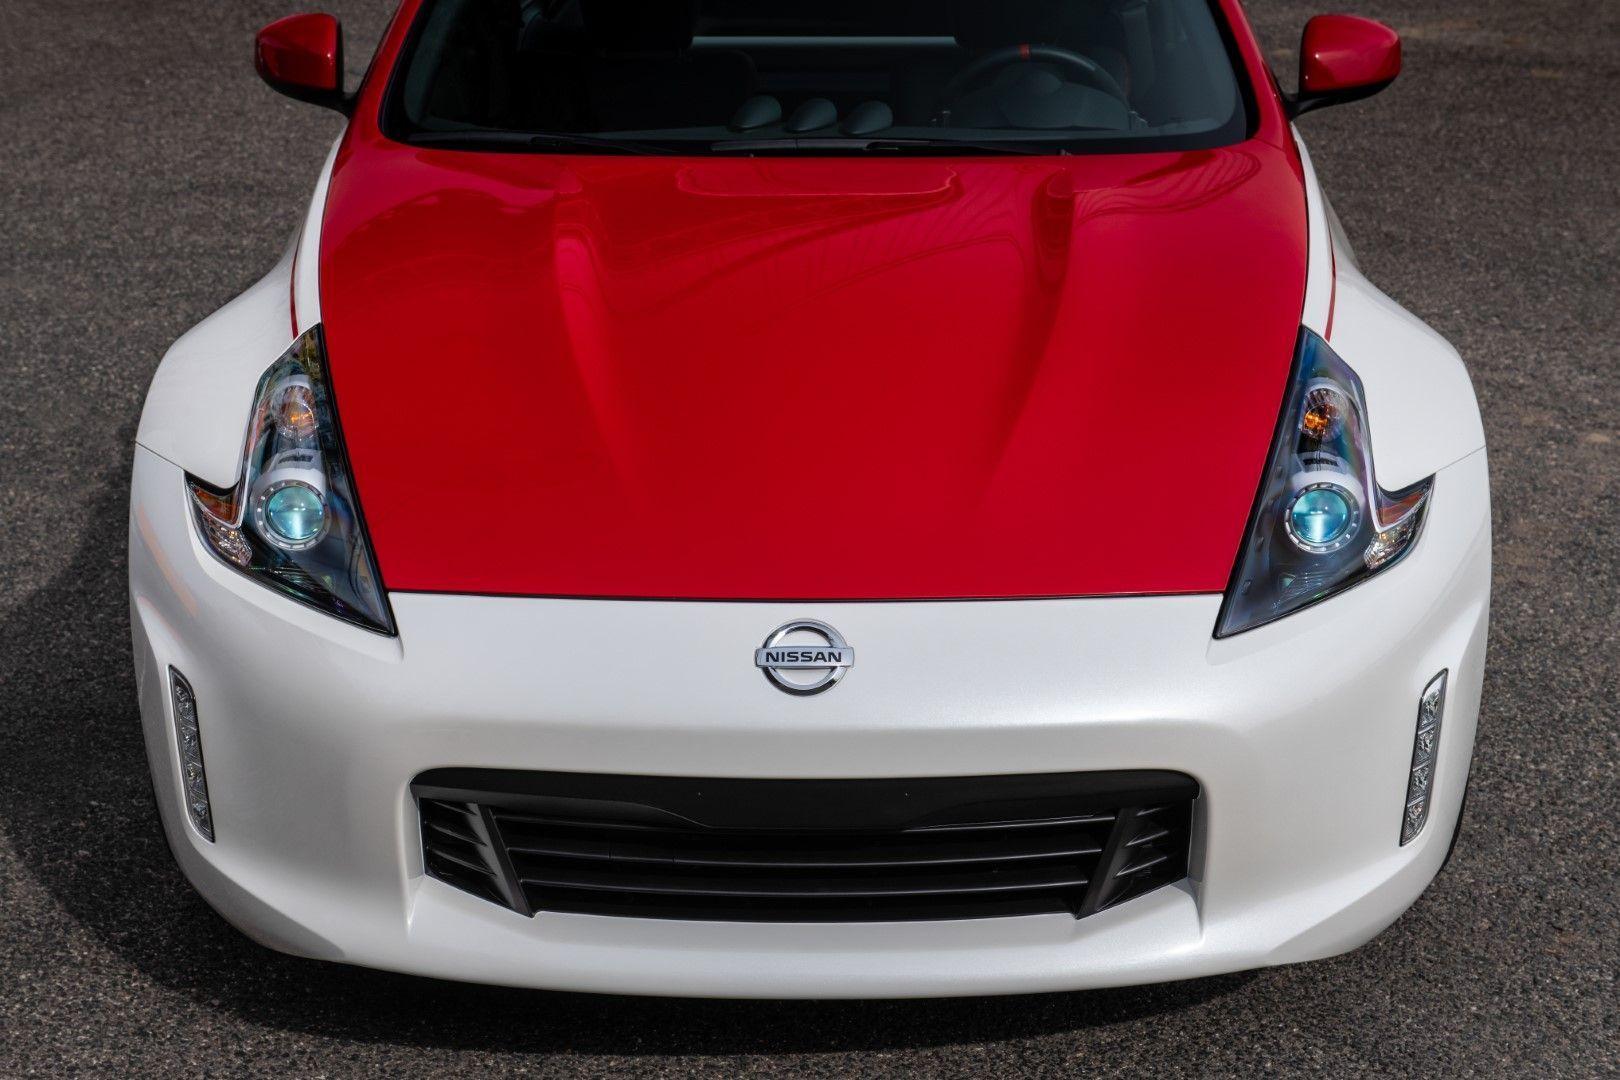 2020 Nissan 370z 50th Anniversary Nissan 370z Nissan Nissan Z Cars